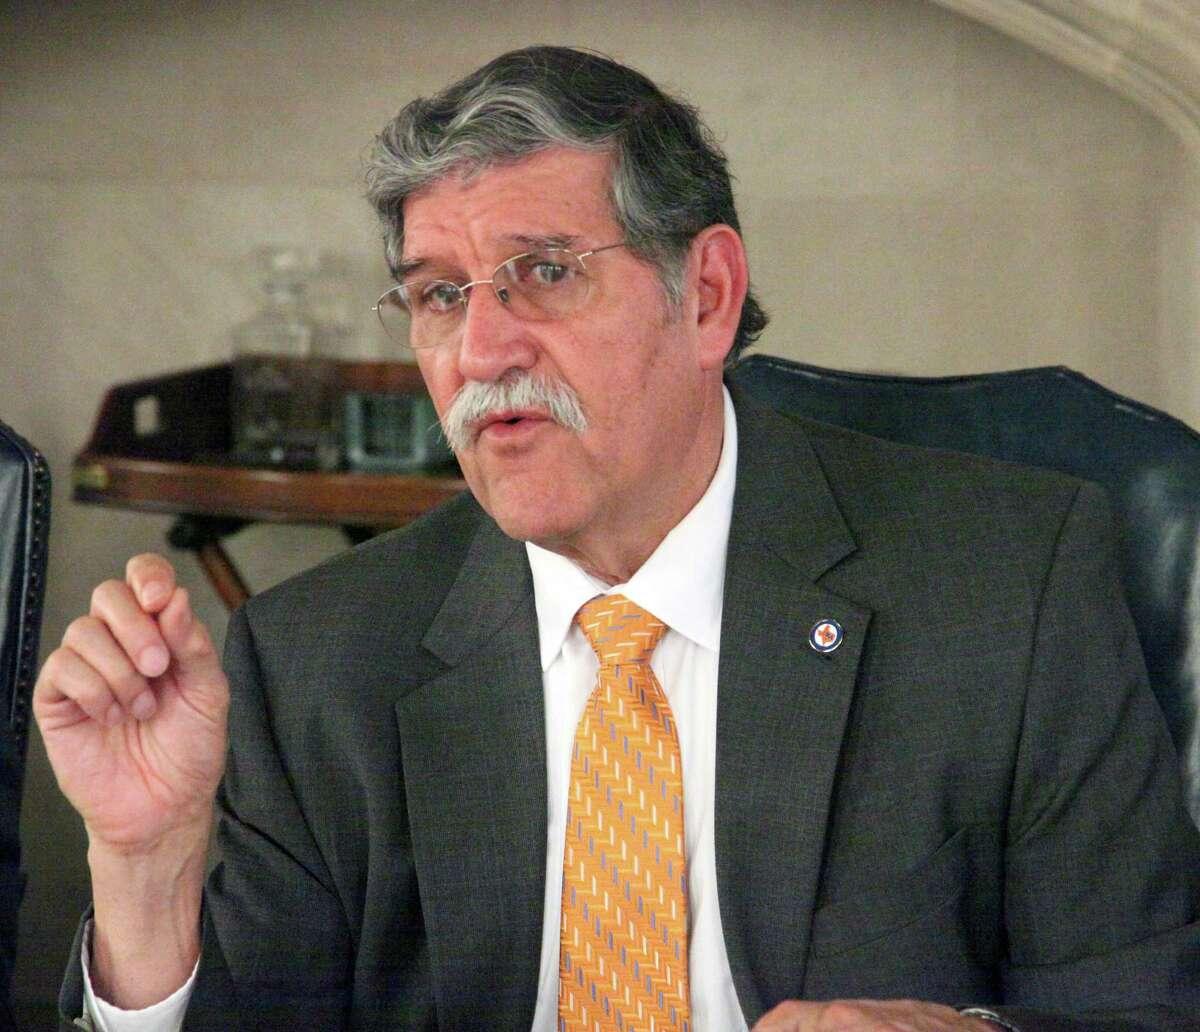 UTSA President Ricardo Romo